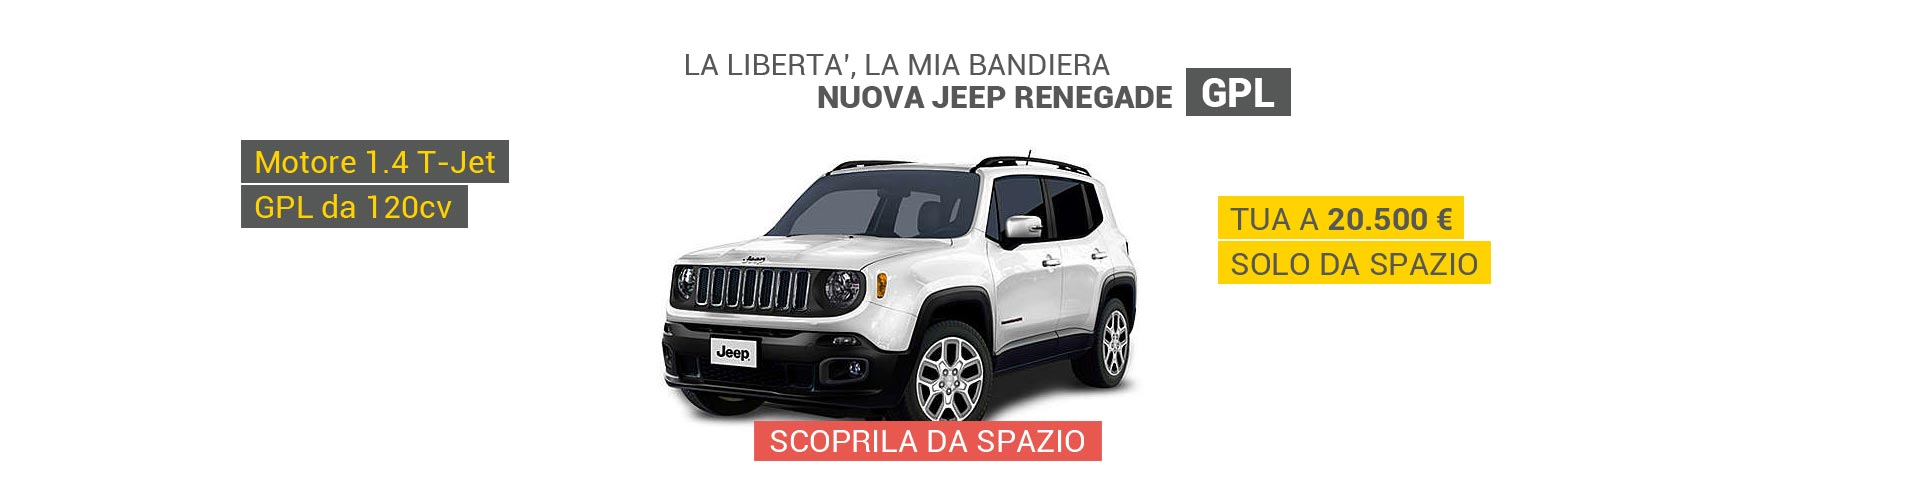 Jeep Renegade GPL